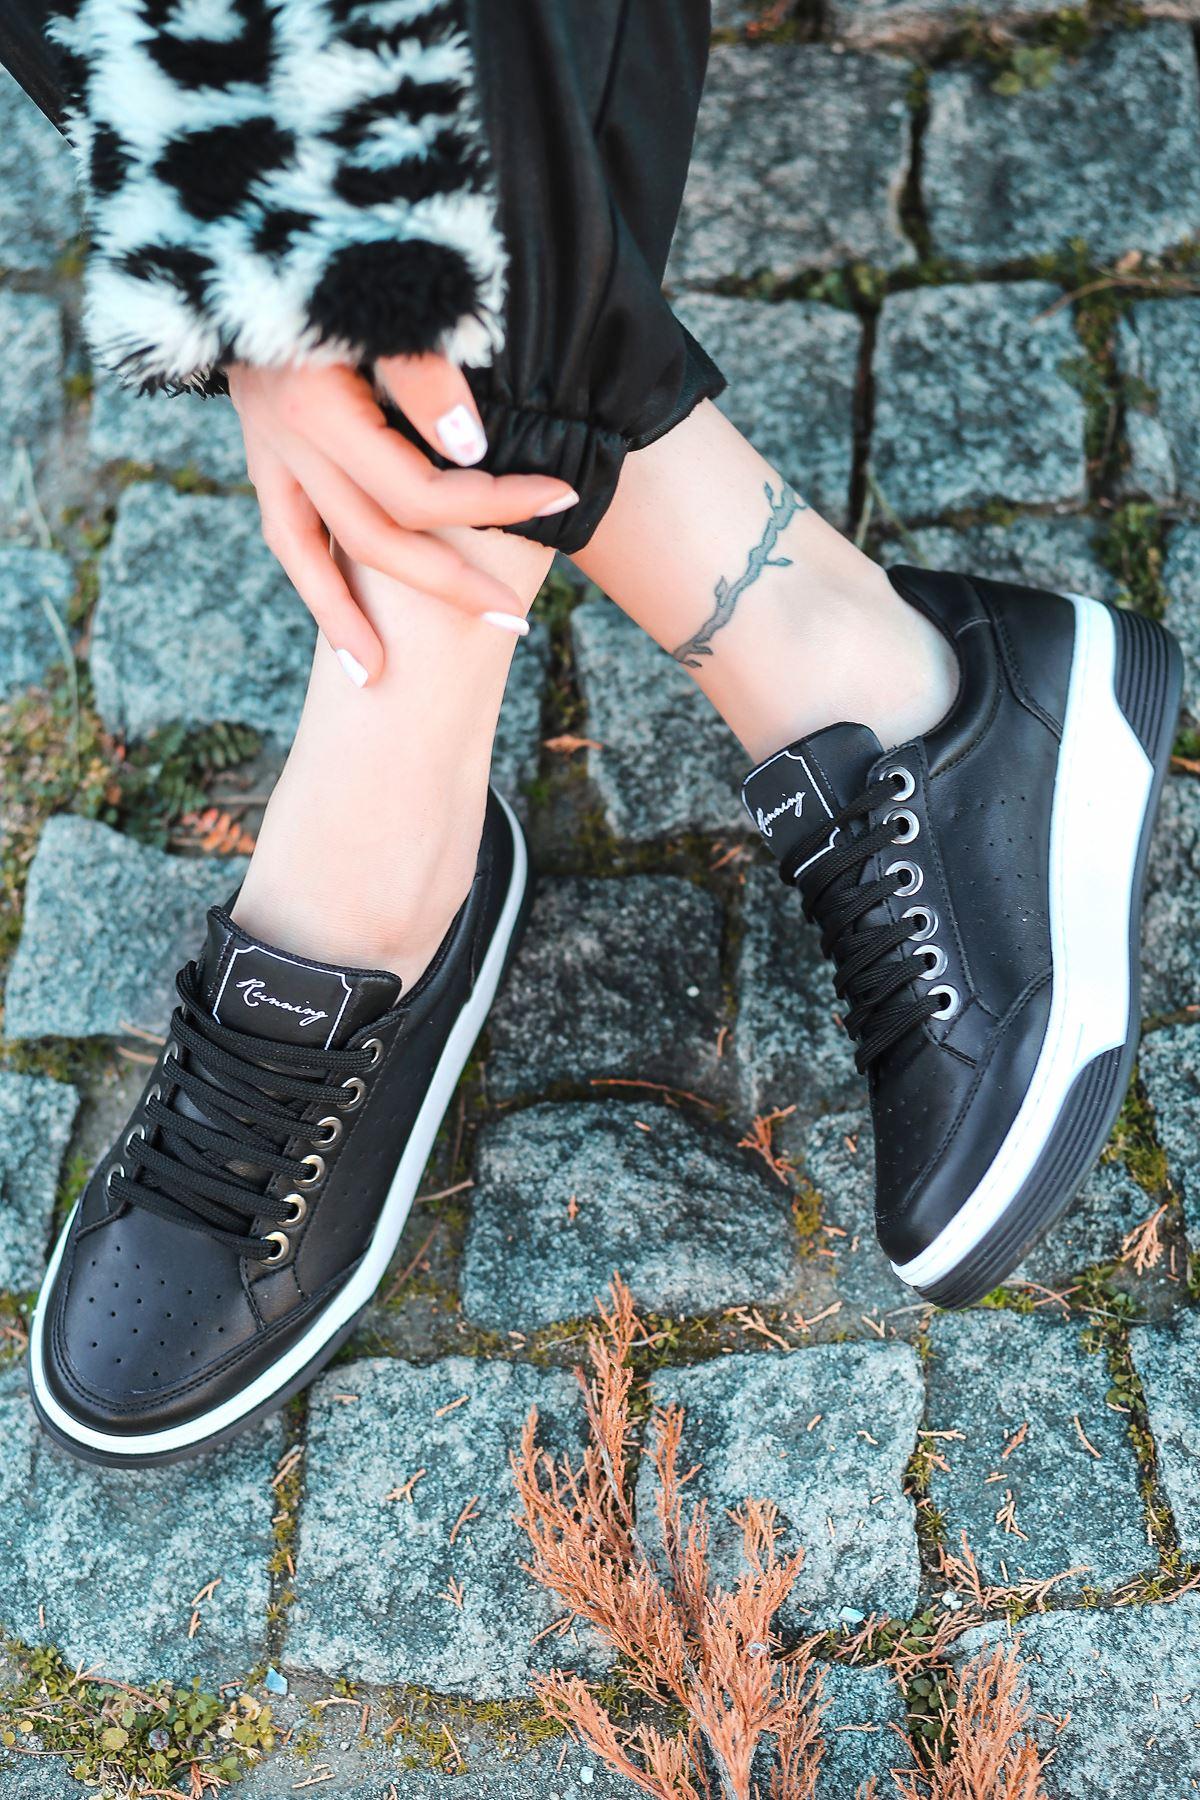 Fuzzy Mat Deri Siyah Taban Bağcık Detay Siyah Sneakers